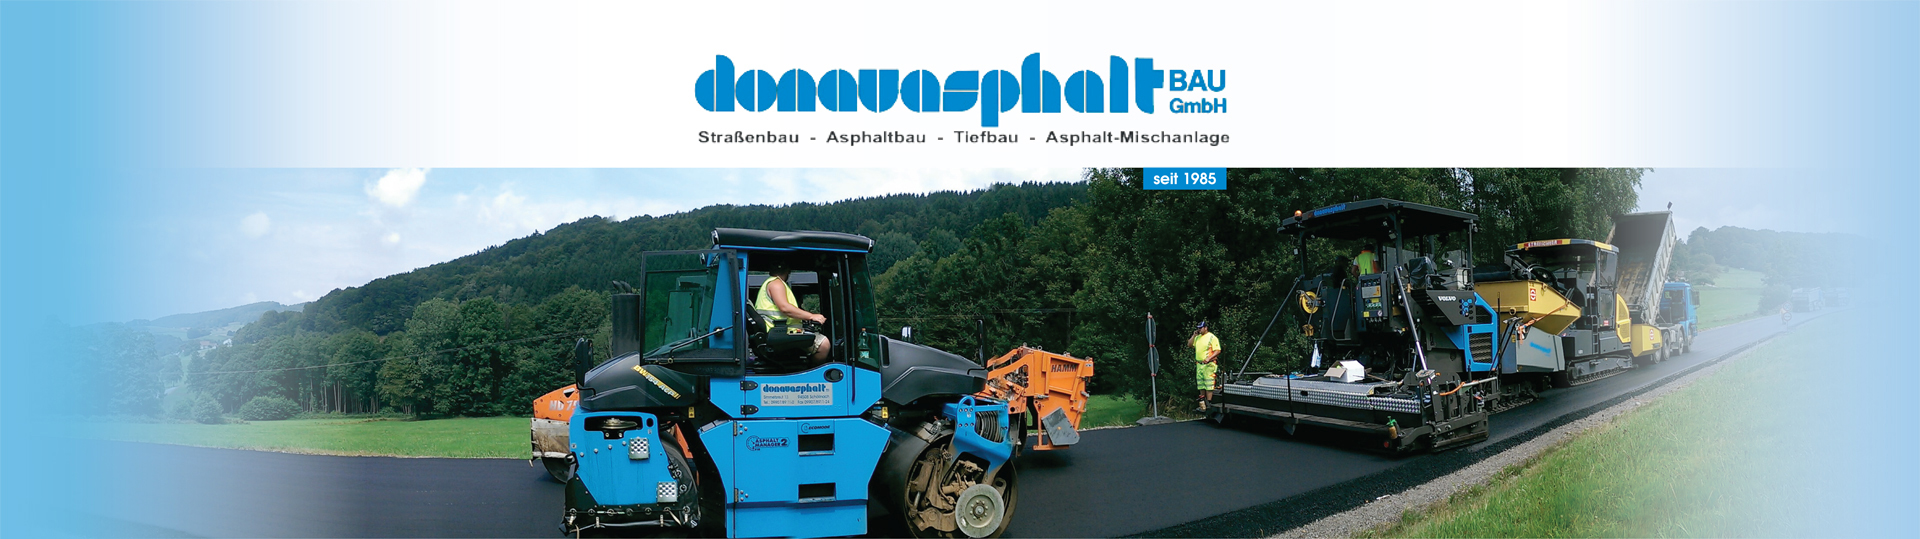 Donauasphalt Bau GmbH – Straßenbau, Asphaltbau, Tiefbau